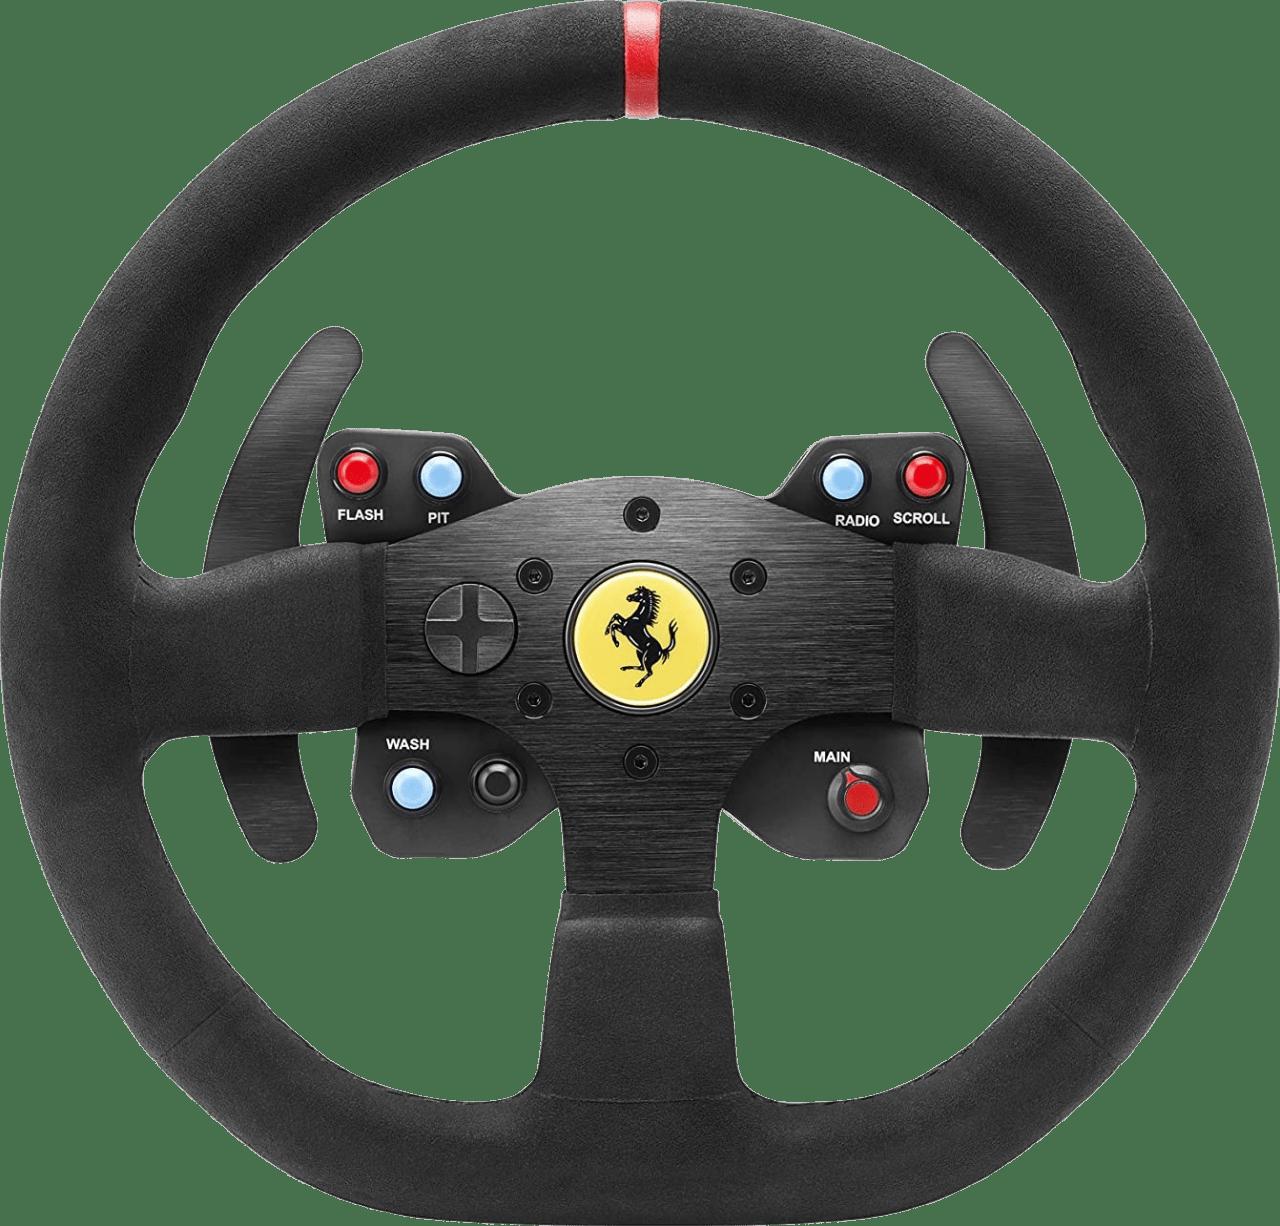 Black Thrustmaster T300 Ferrari Racing Steering Wheel.2